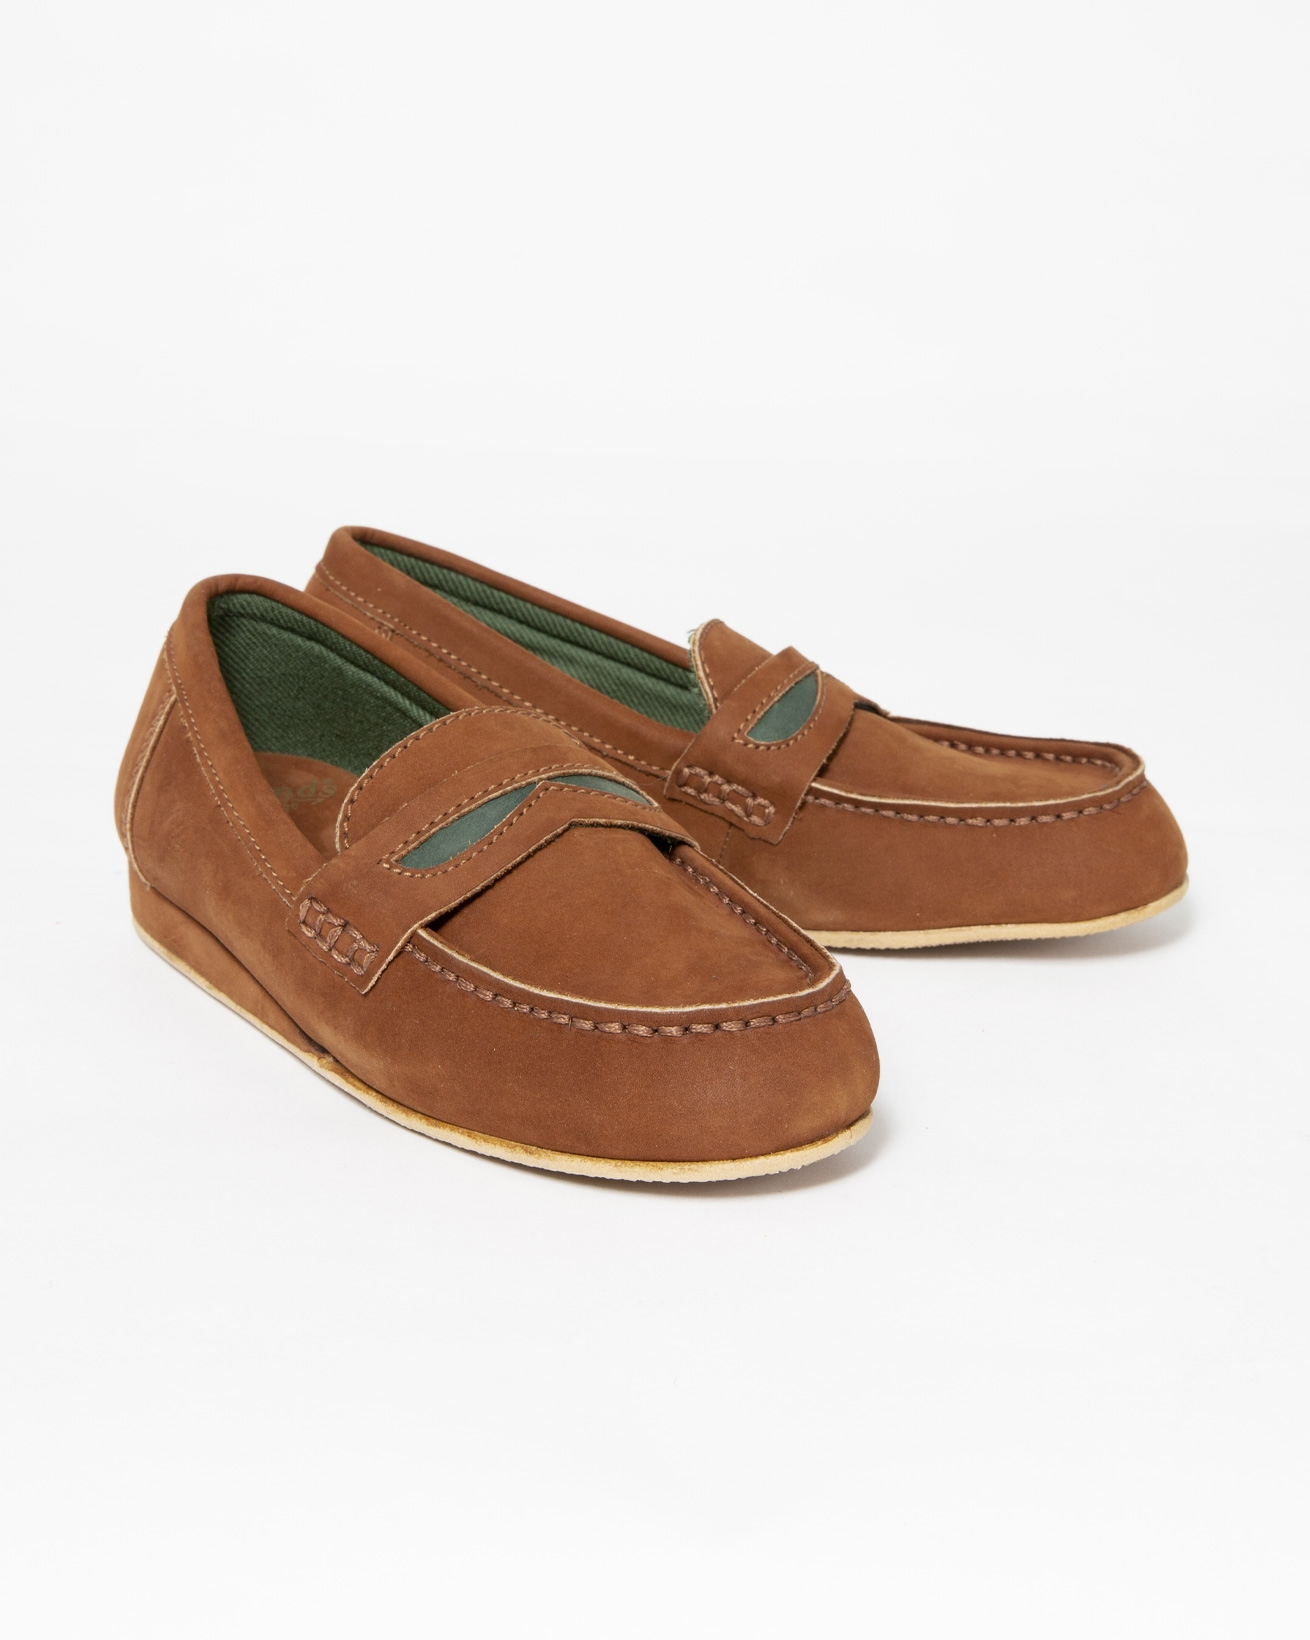 Ladies Loafer Slipper - Size EU 37 - Tan & Green